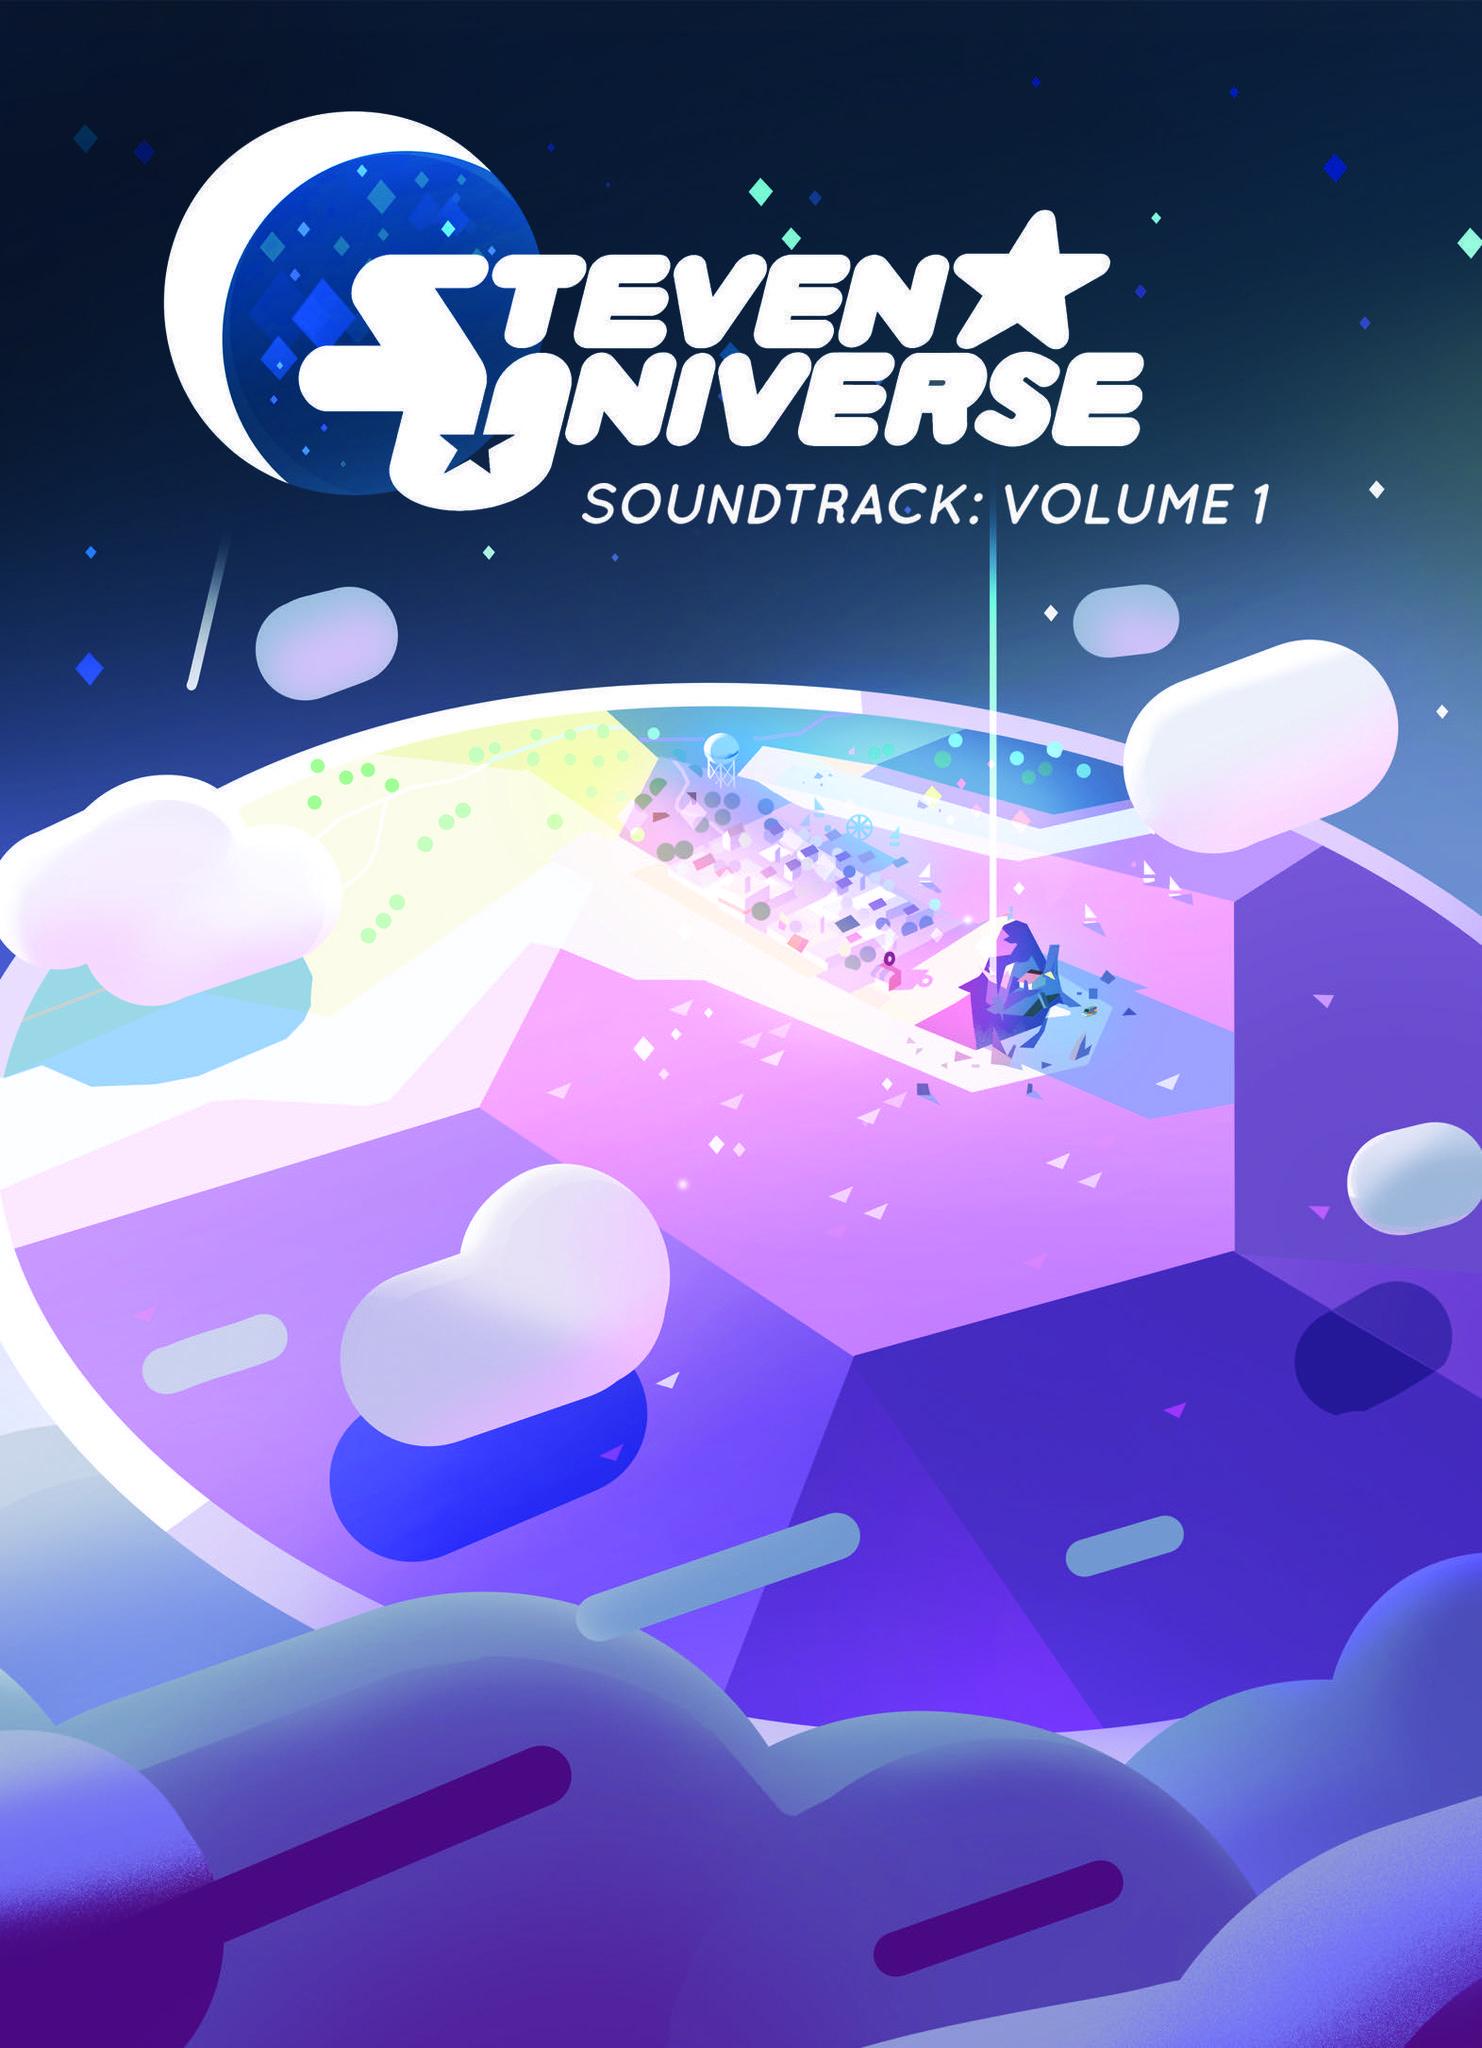 la-et-steven-universe-soundtrack-volume-1-20170411.jpg